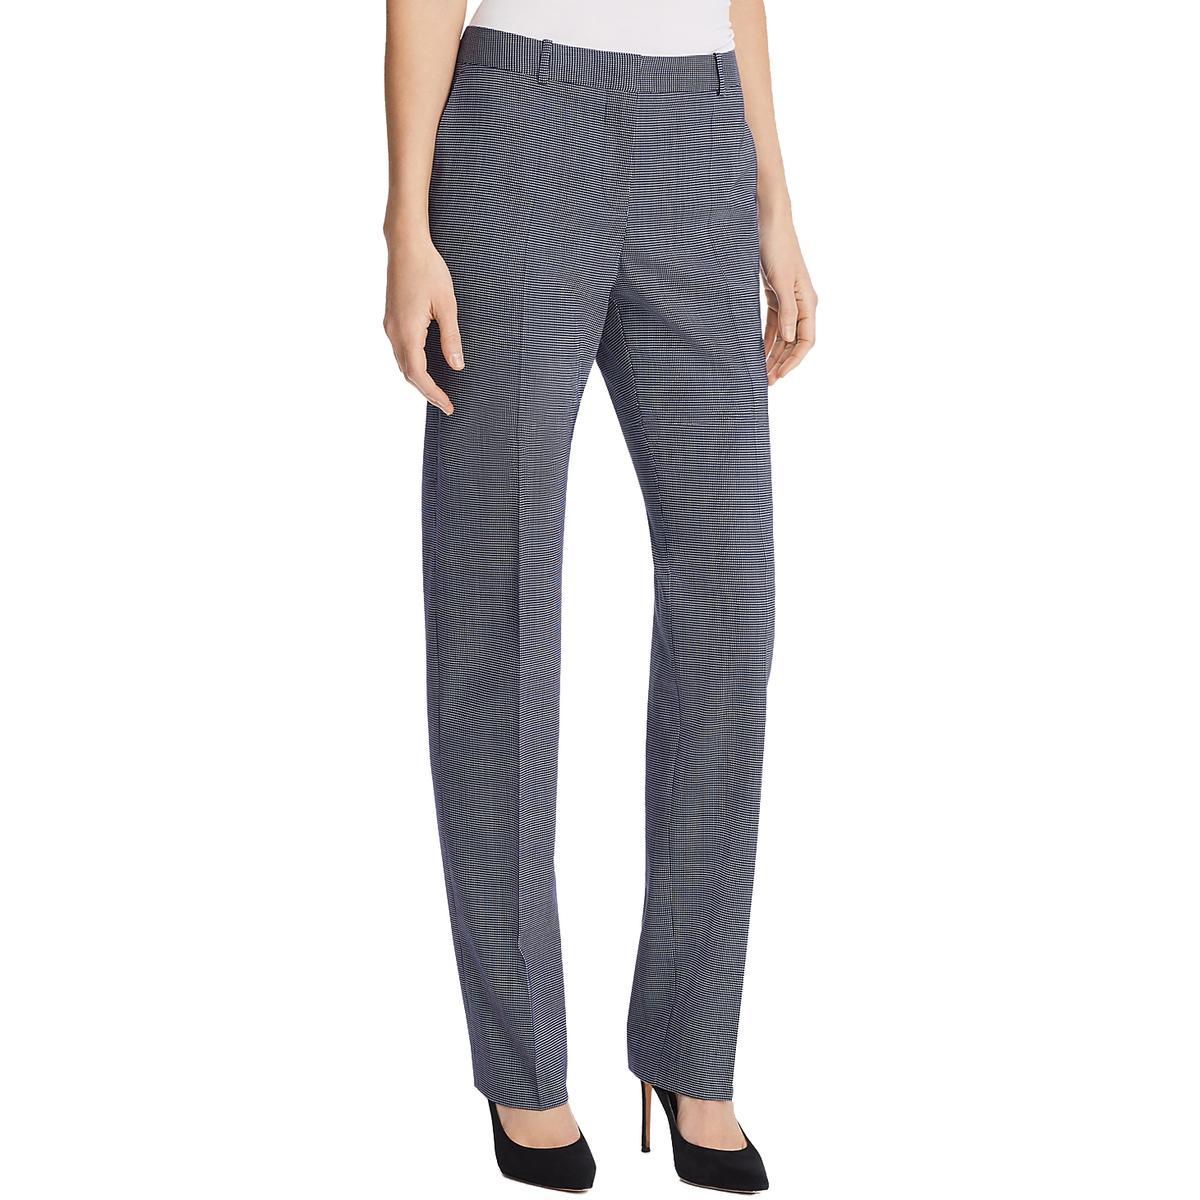 Hugo Boss Womens Blue Suiting Microcheck Business Dress Pants 14 BHFO 9325